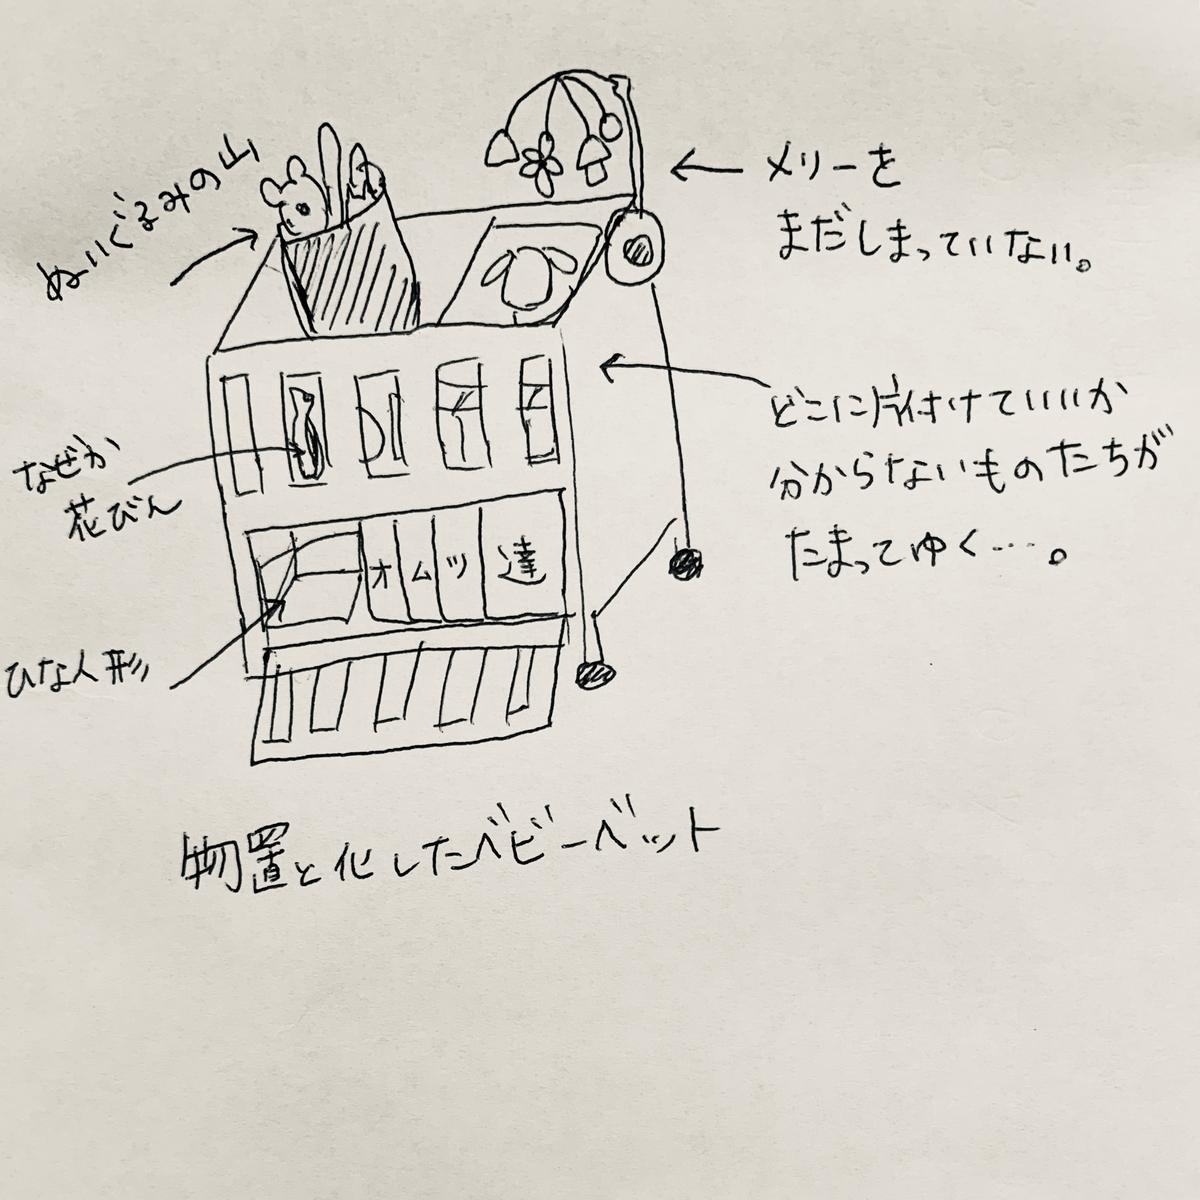 f:id:nananan0:20190514160053j:plain